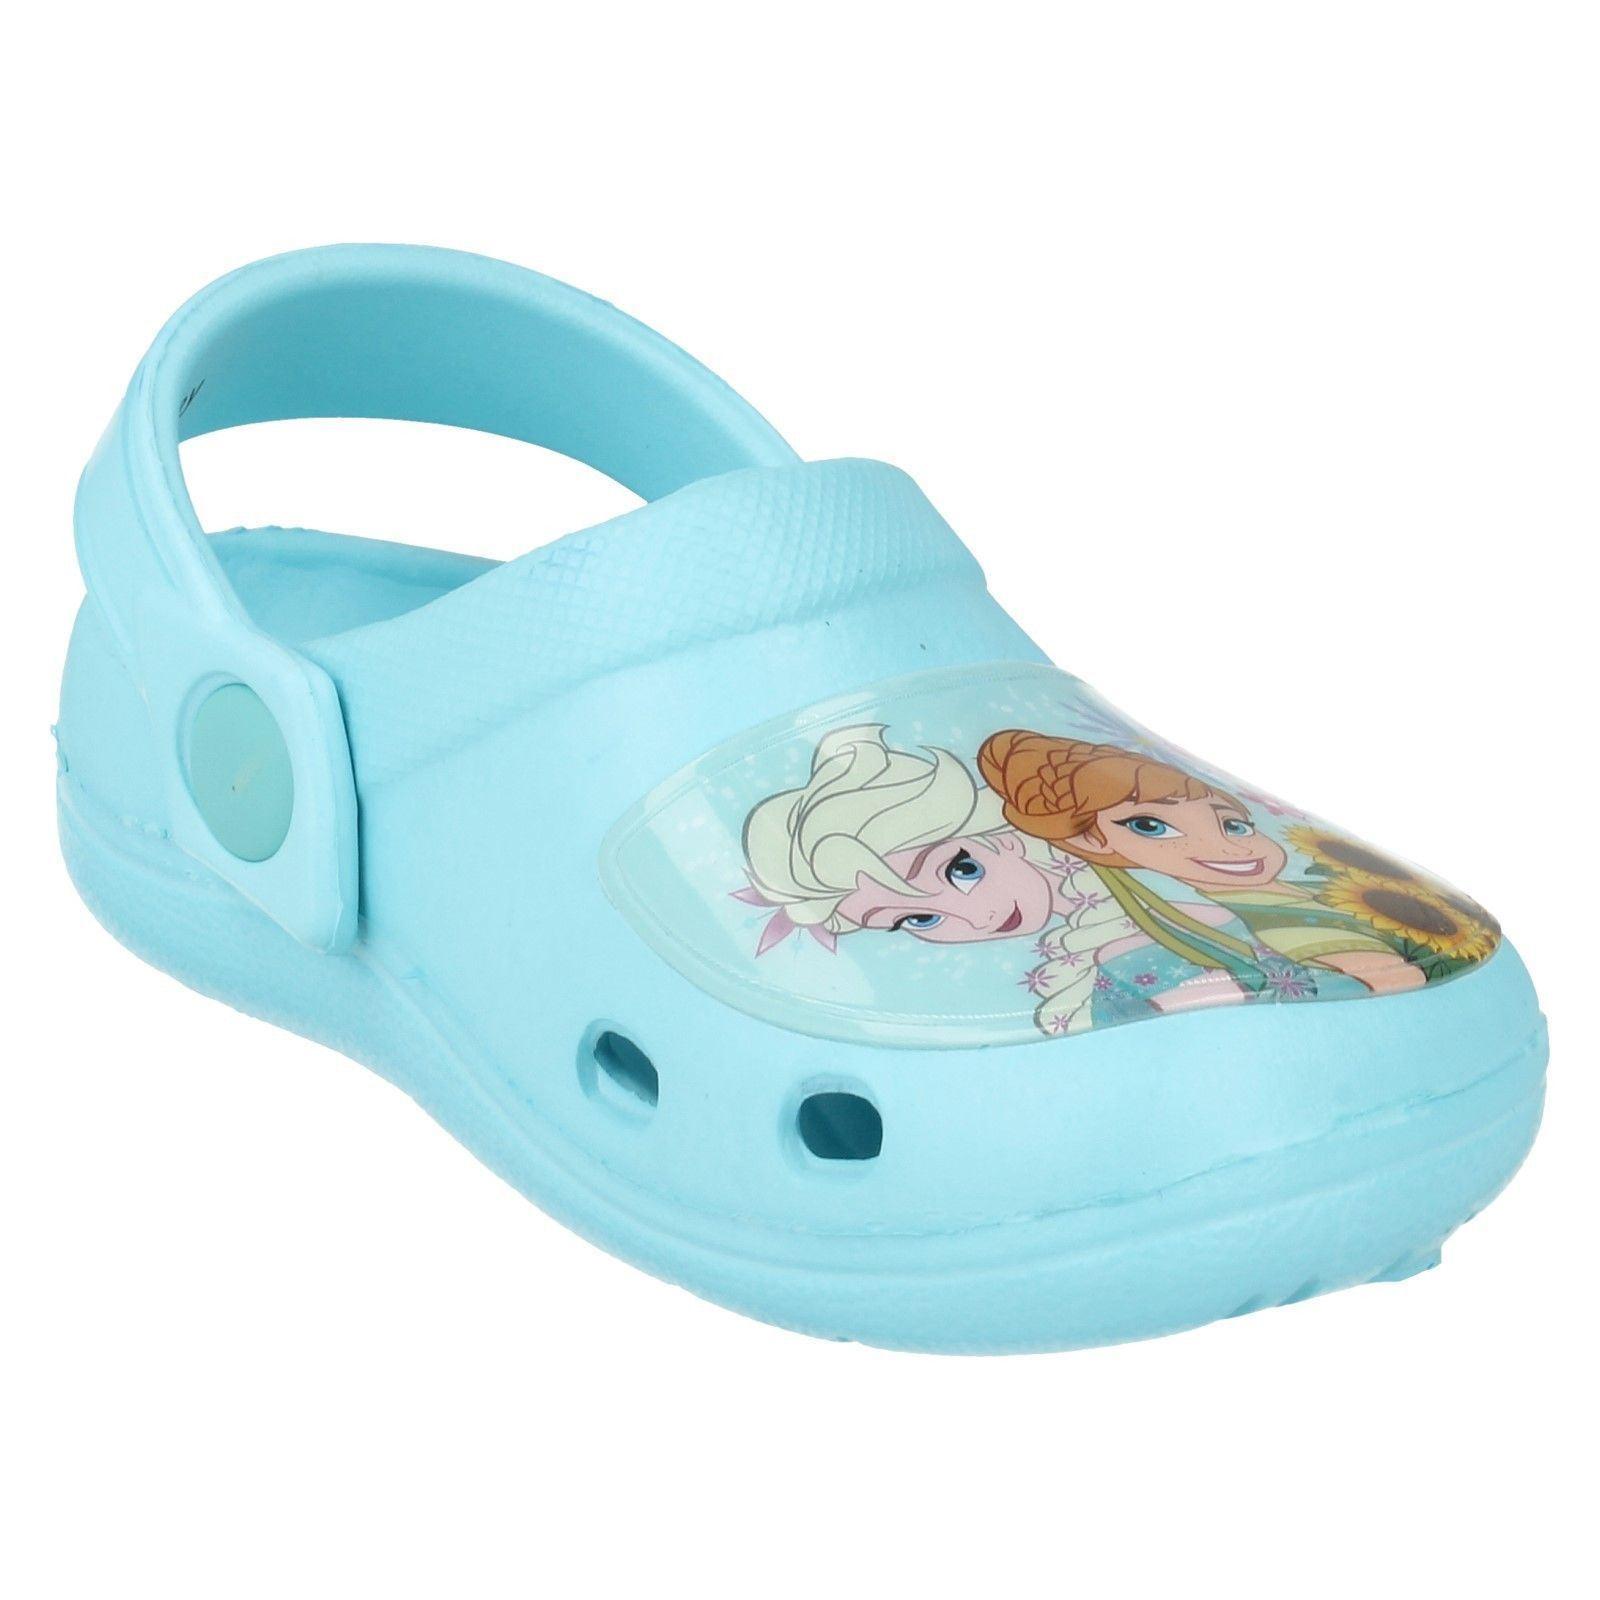 Chicas Disney Frozen Ligero Sandalias De Verano De Playa fiebre Grace